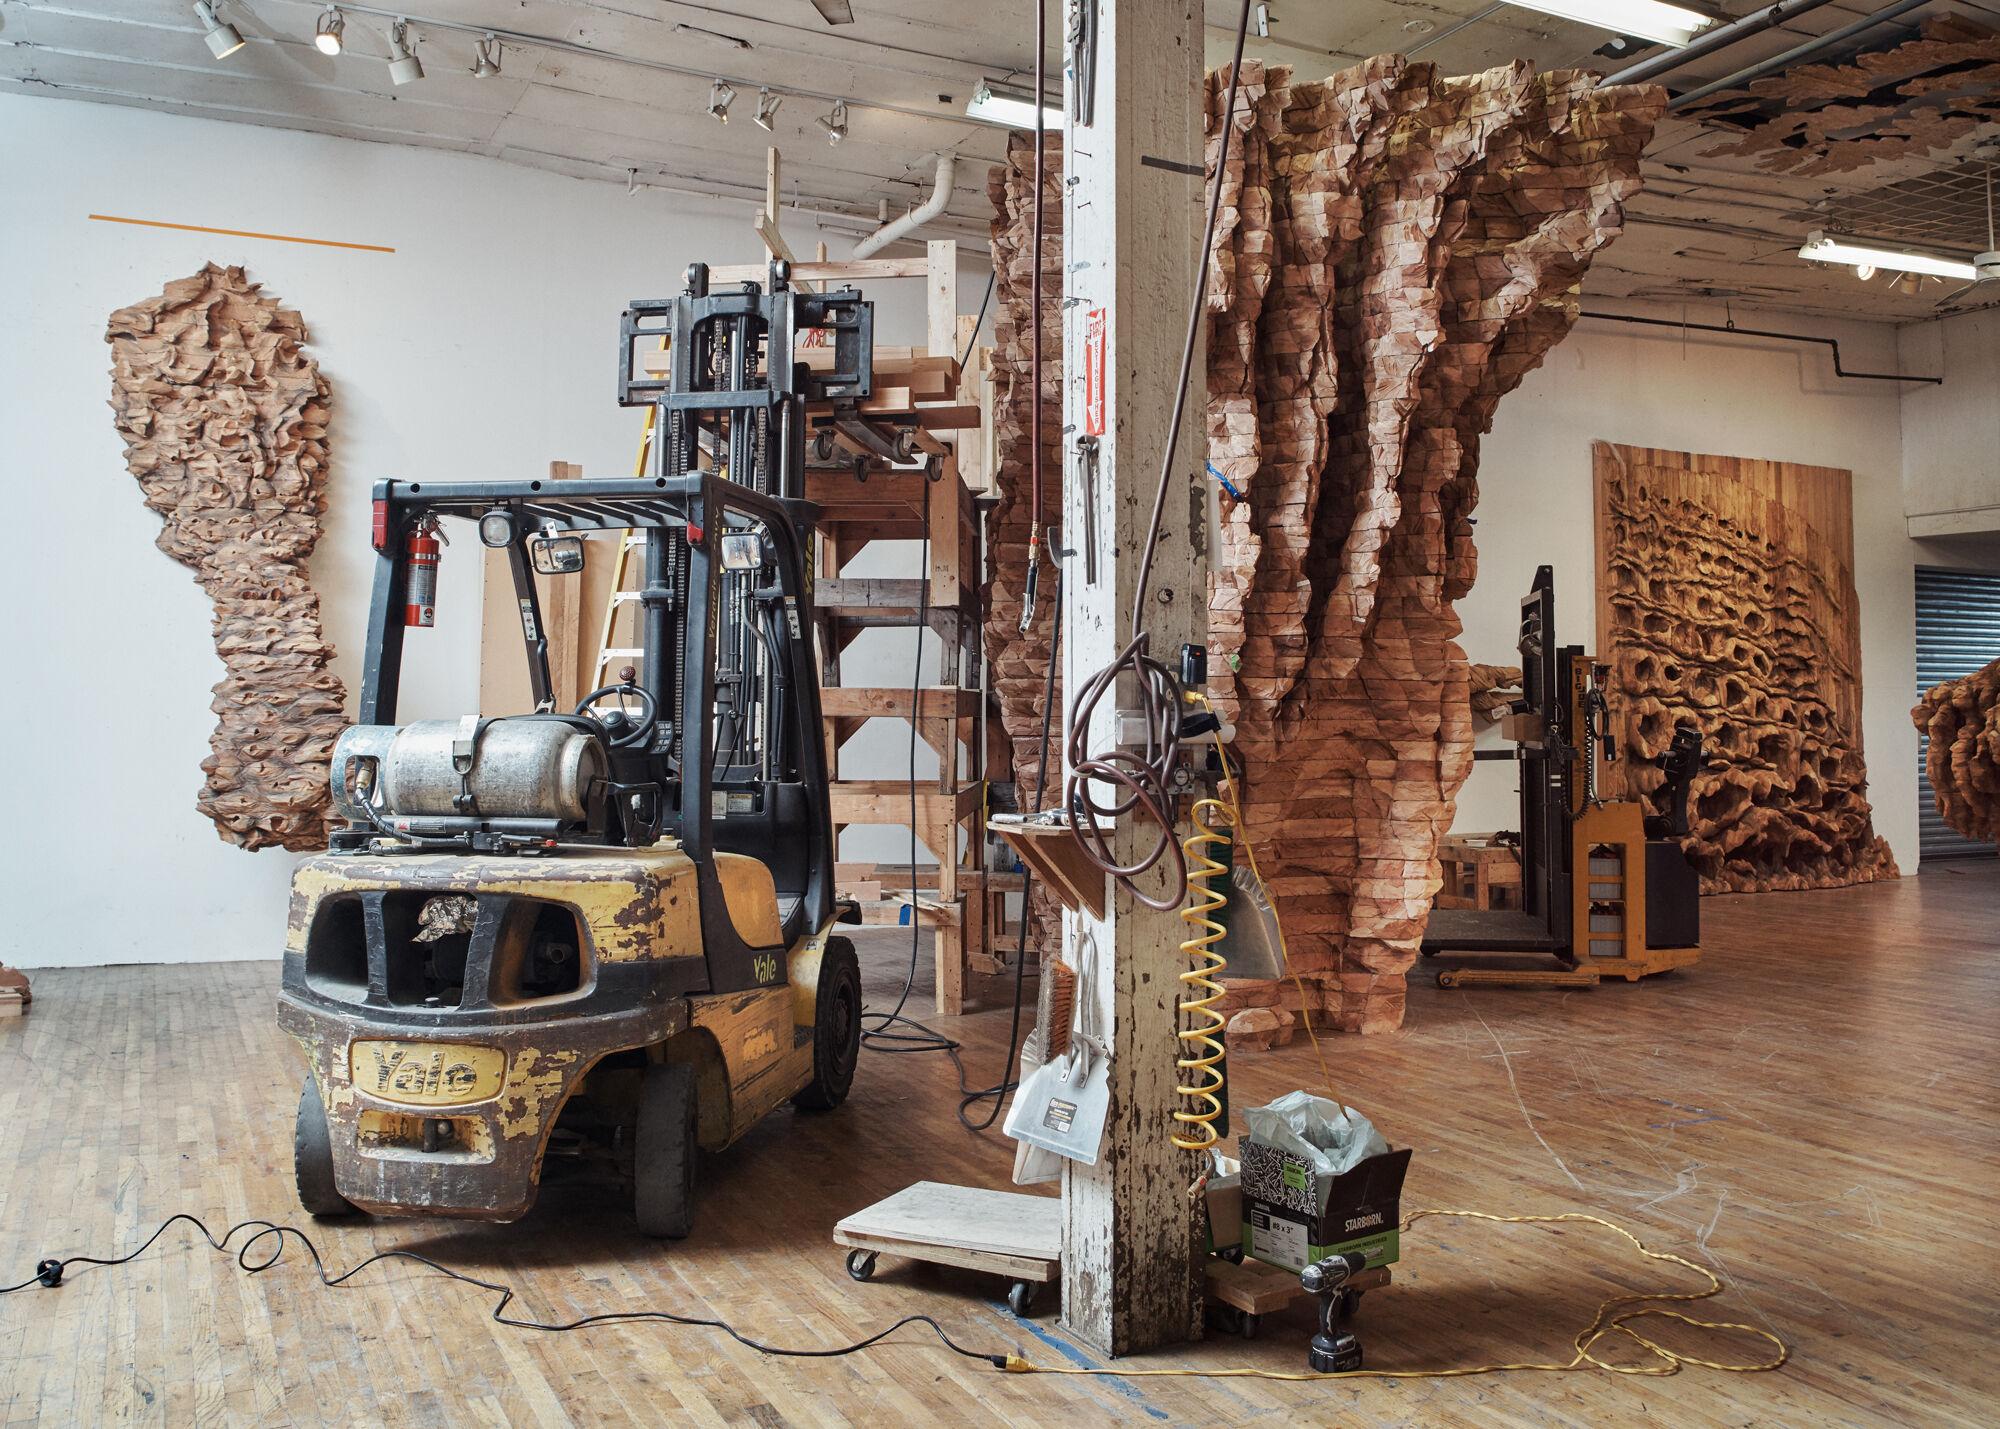 View of Ursula von Rydingsvard's studio in Bushwick, Brooklyn. Photo by Alex John Beck for Artsy.